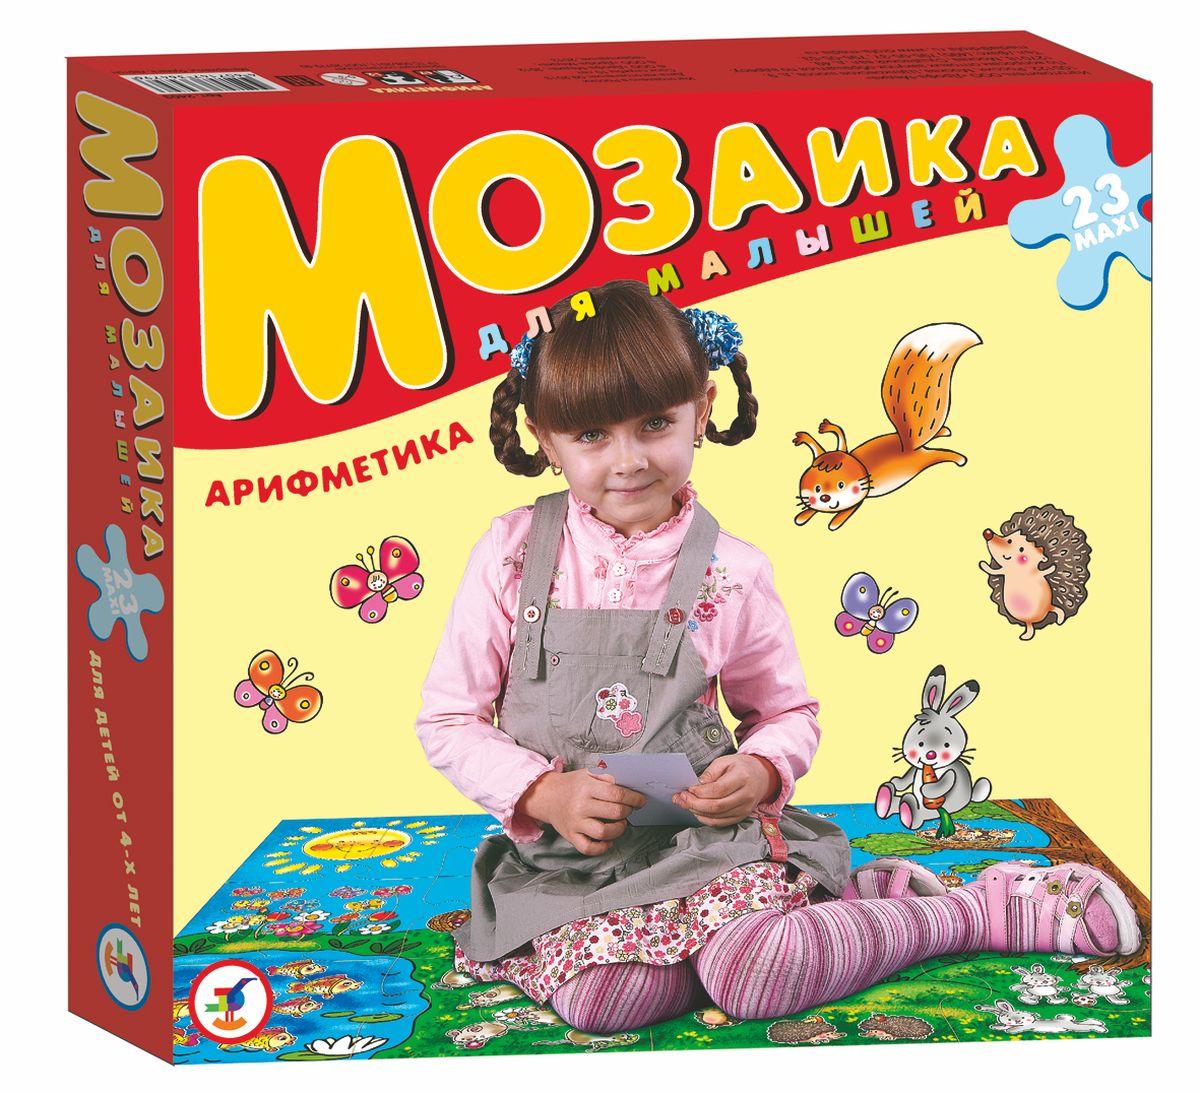 Дрофа-Медиа Мозаика Арифметика дрофа медиа мозаика для малышей арифметика дрофа медиа